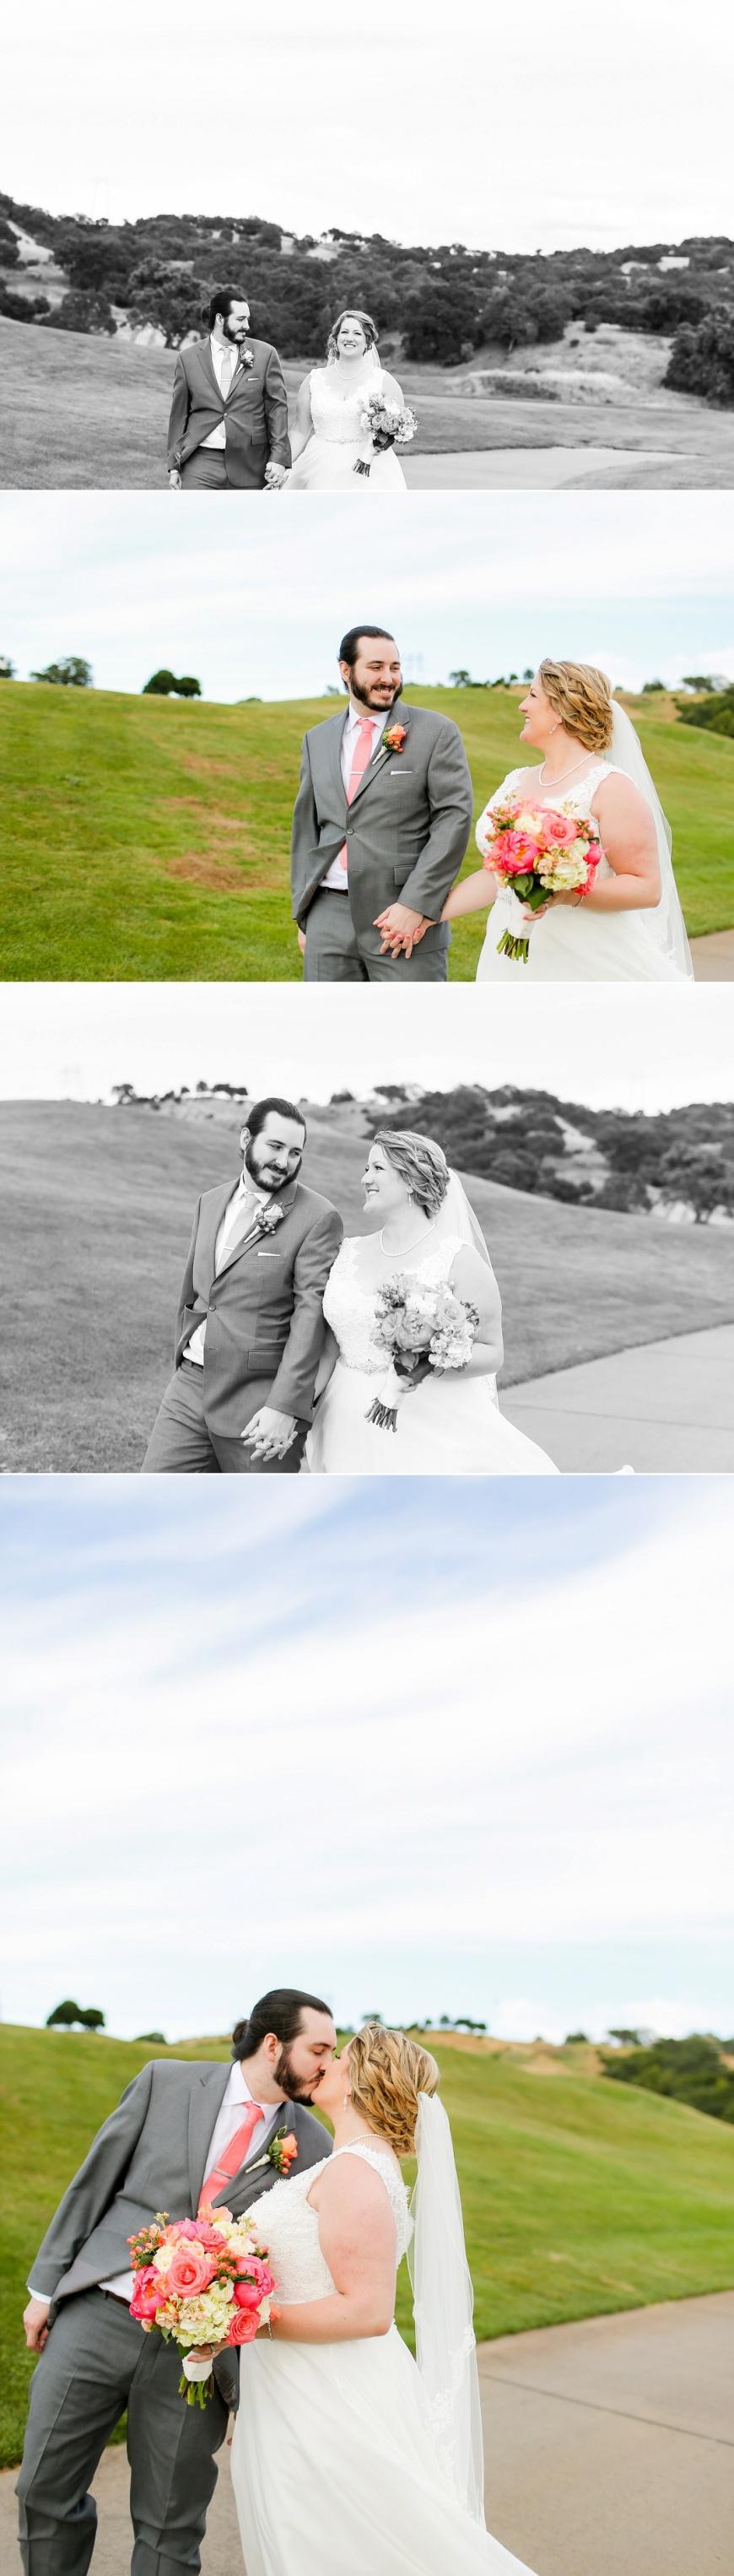 Cinnabar-Hills-Wedding-Jenna-Austin (1080).jpg